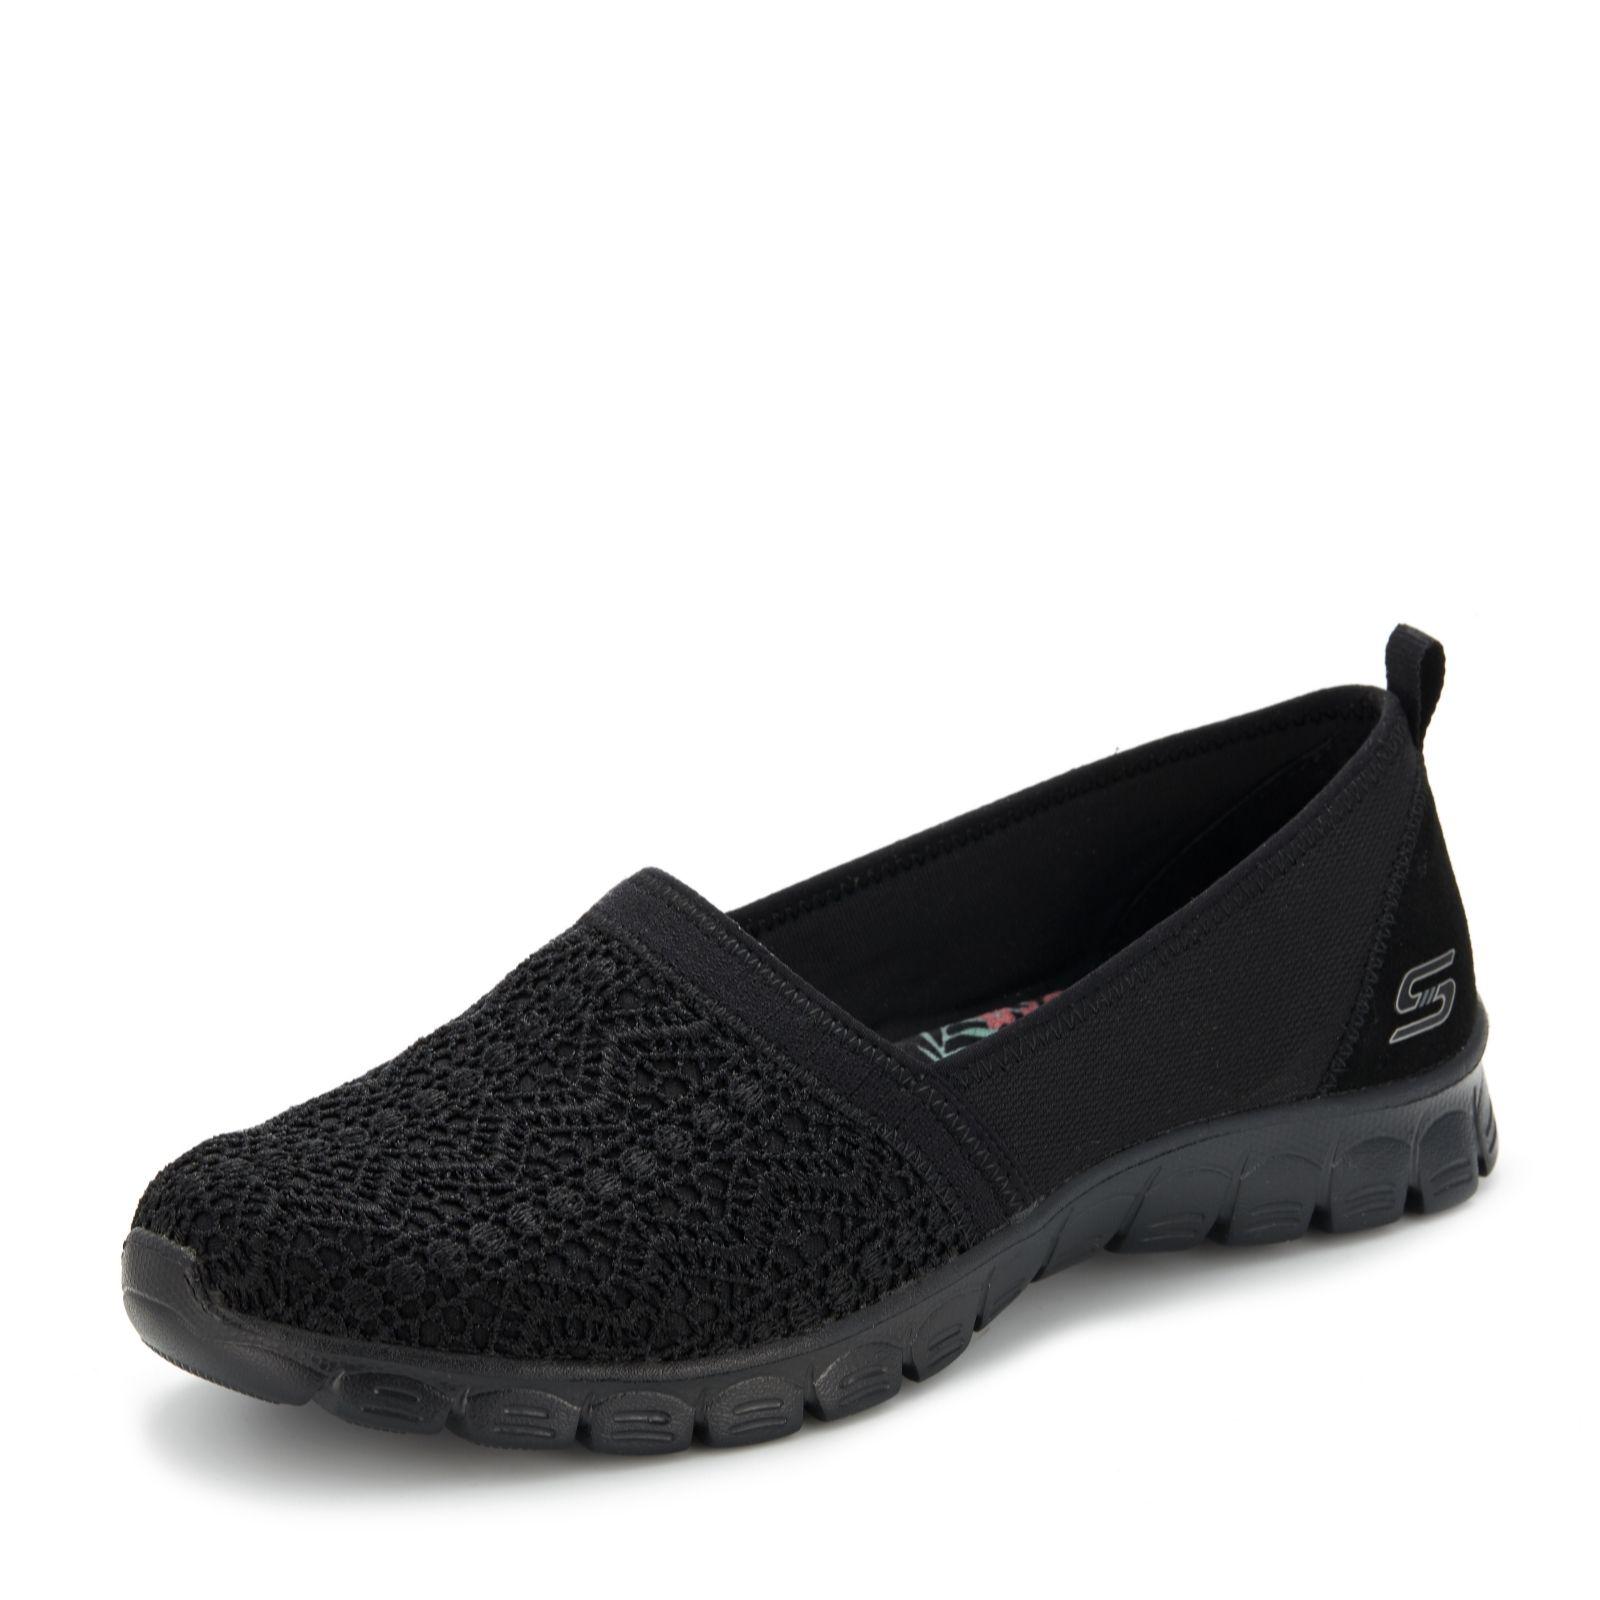 sketchers black boots. skechers ez flex 3.0 duchess crochet slip on shoe - 163119 sketchers black boots